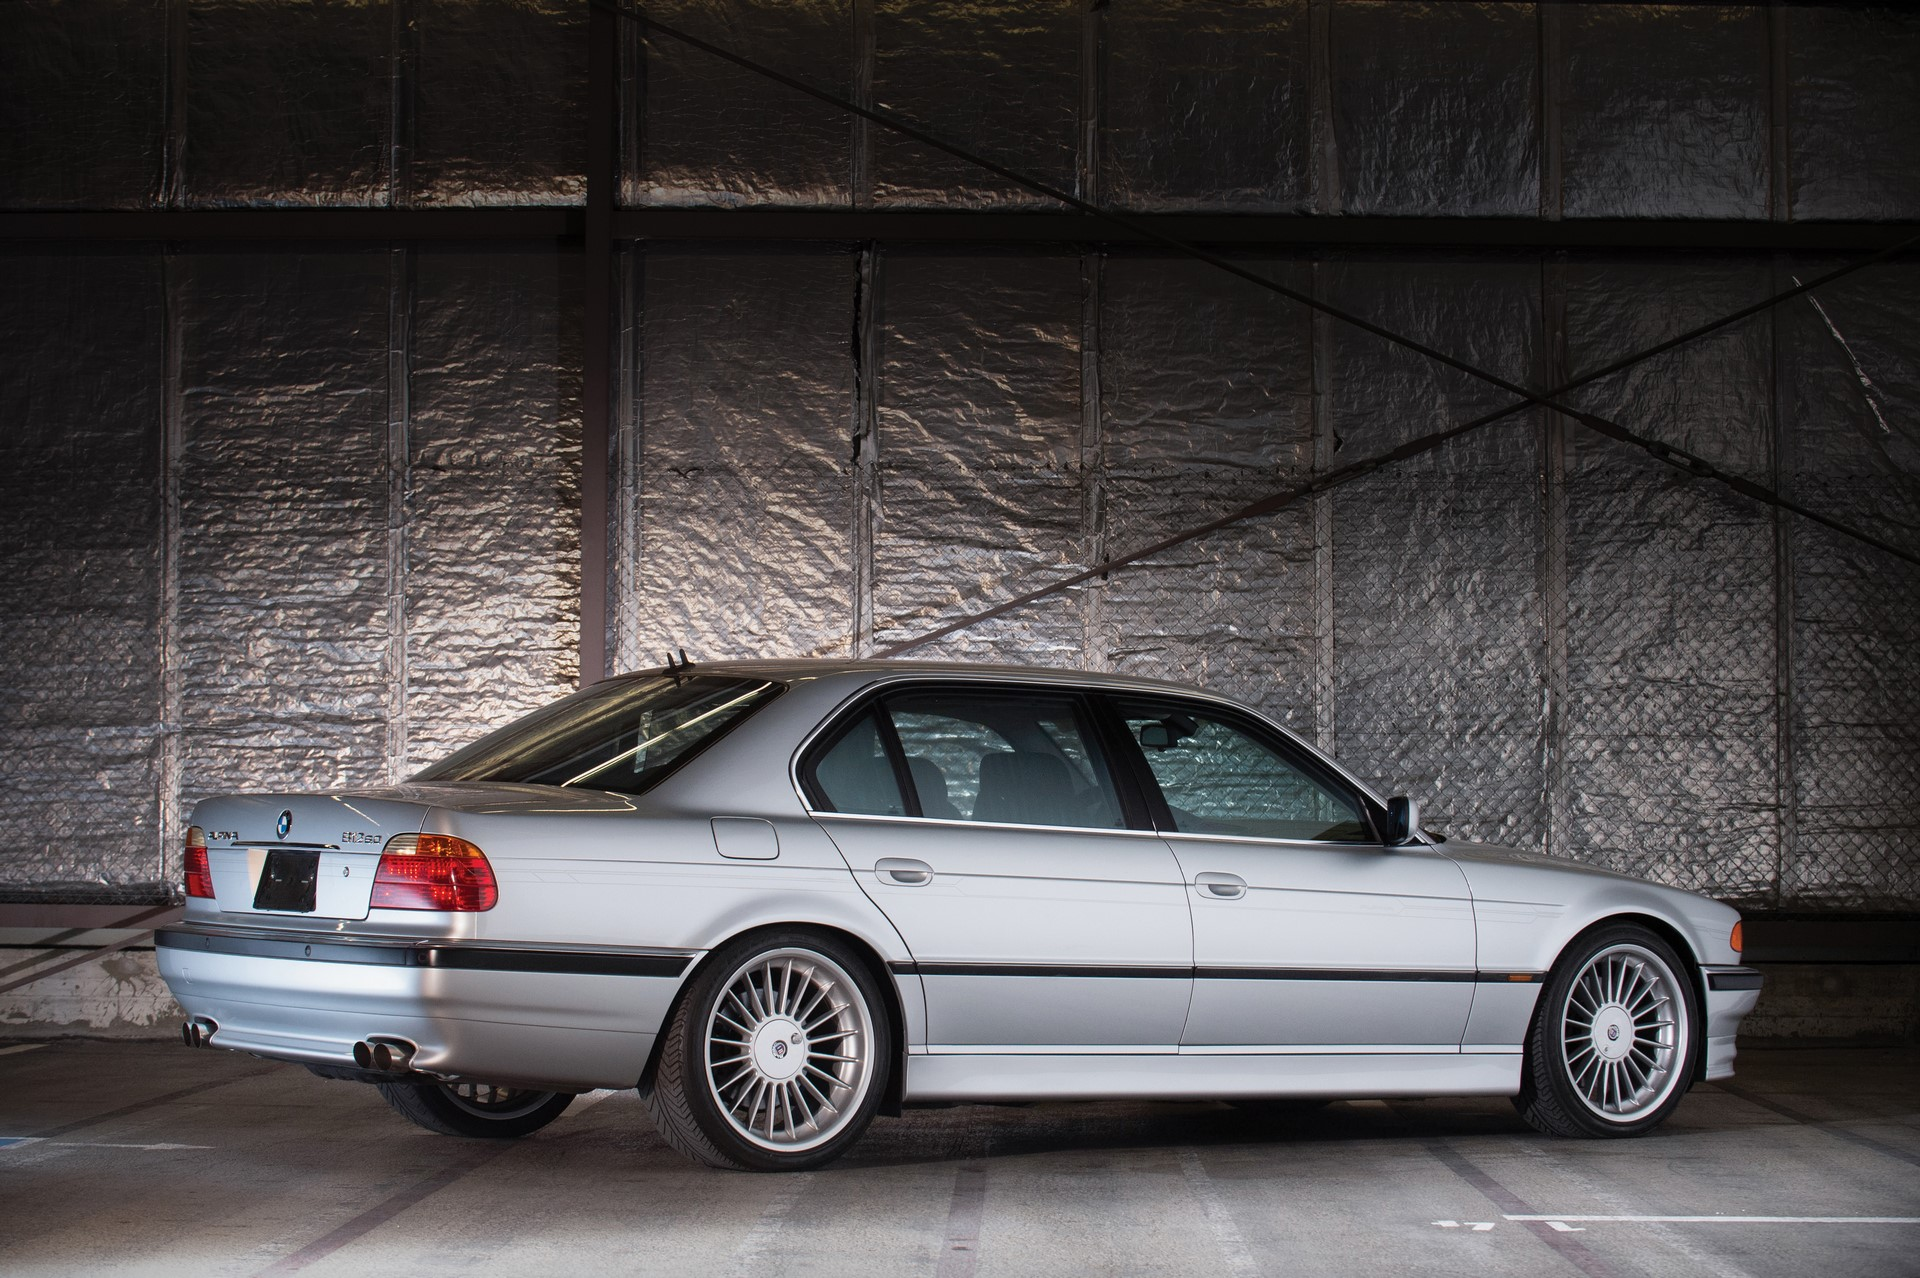 2000-BMW-Alpina-B12-6-0-Langversion_1